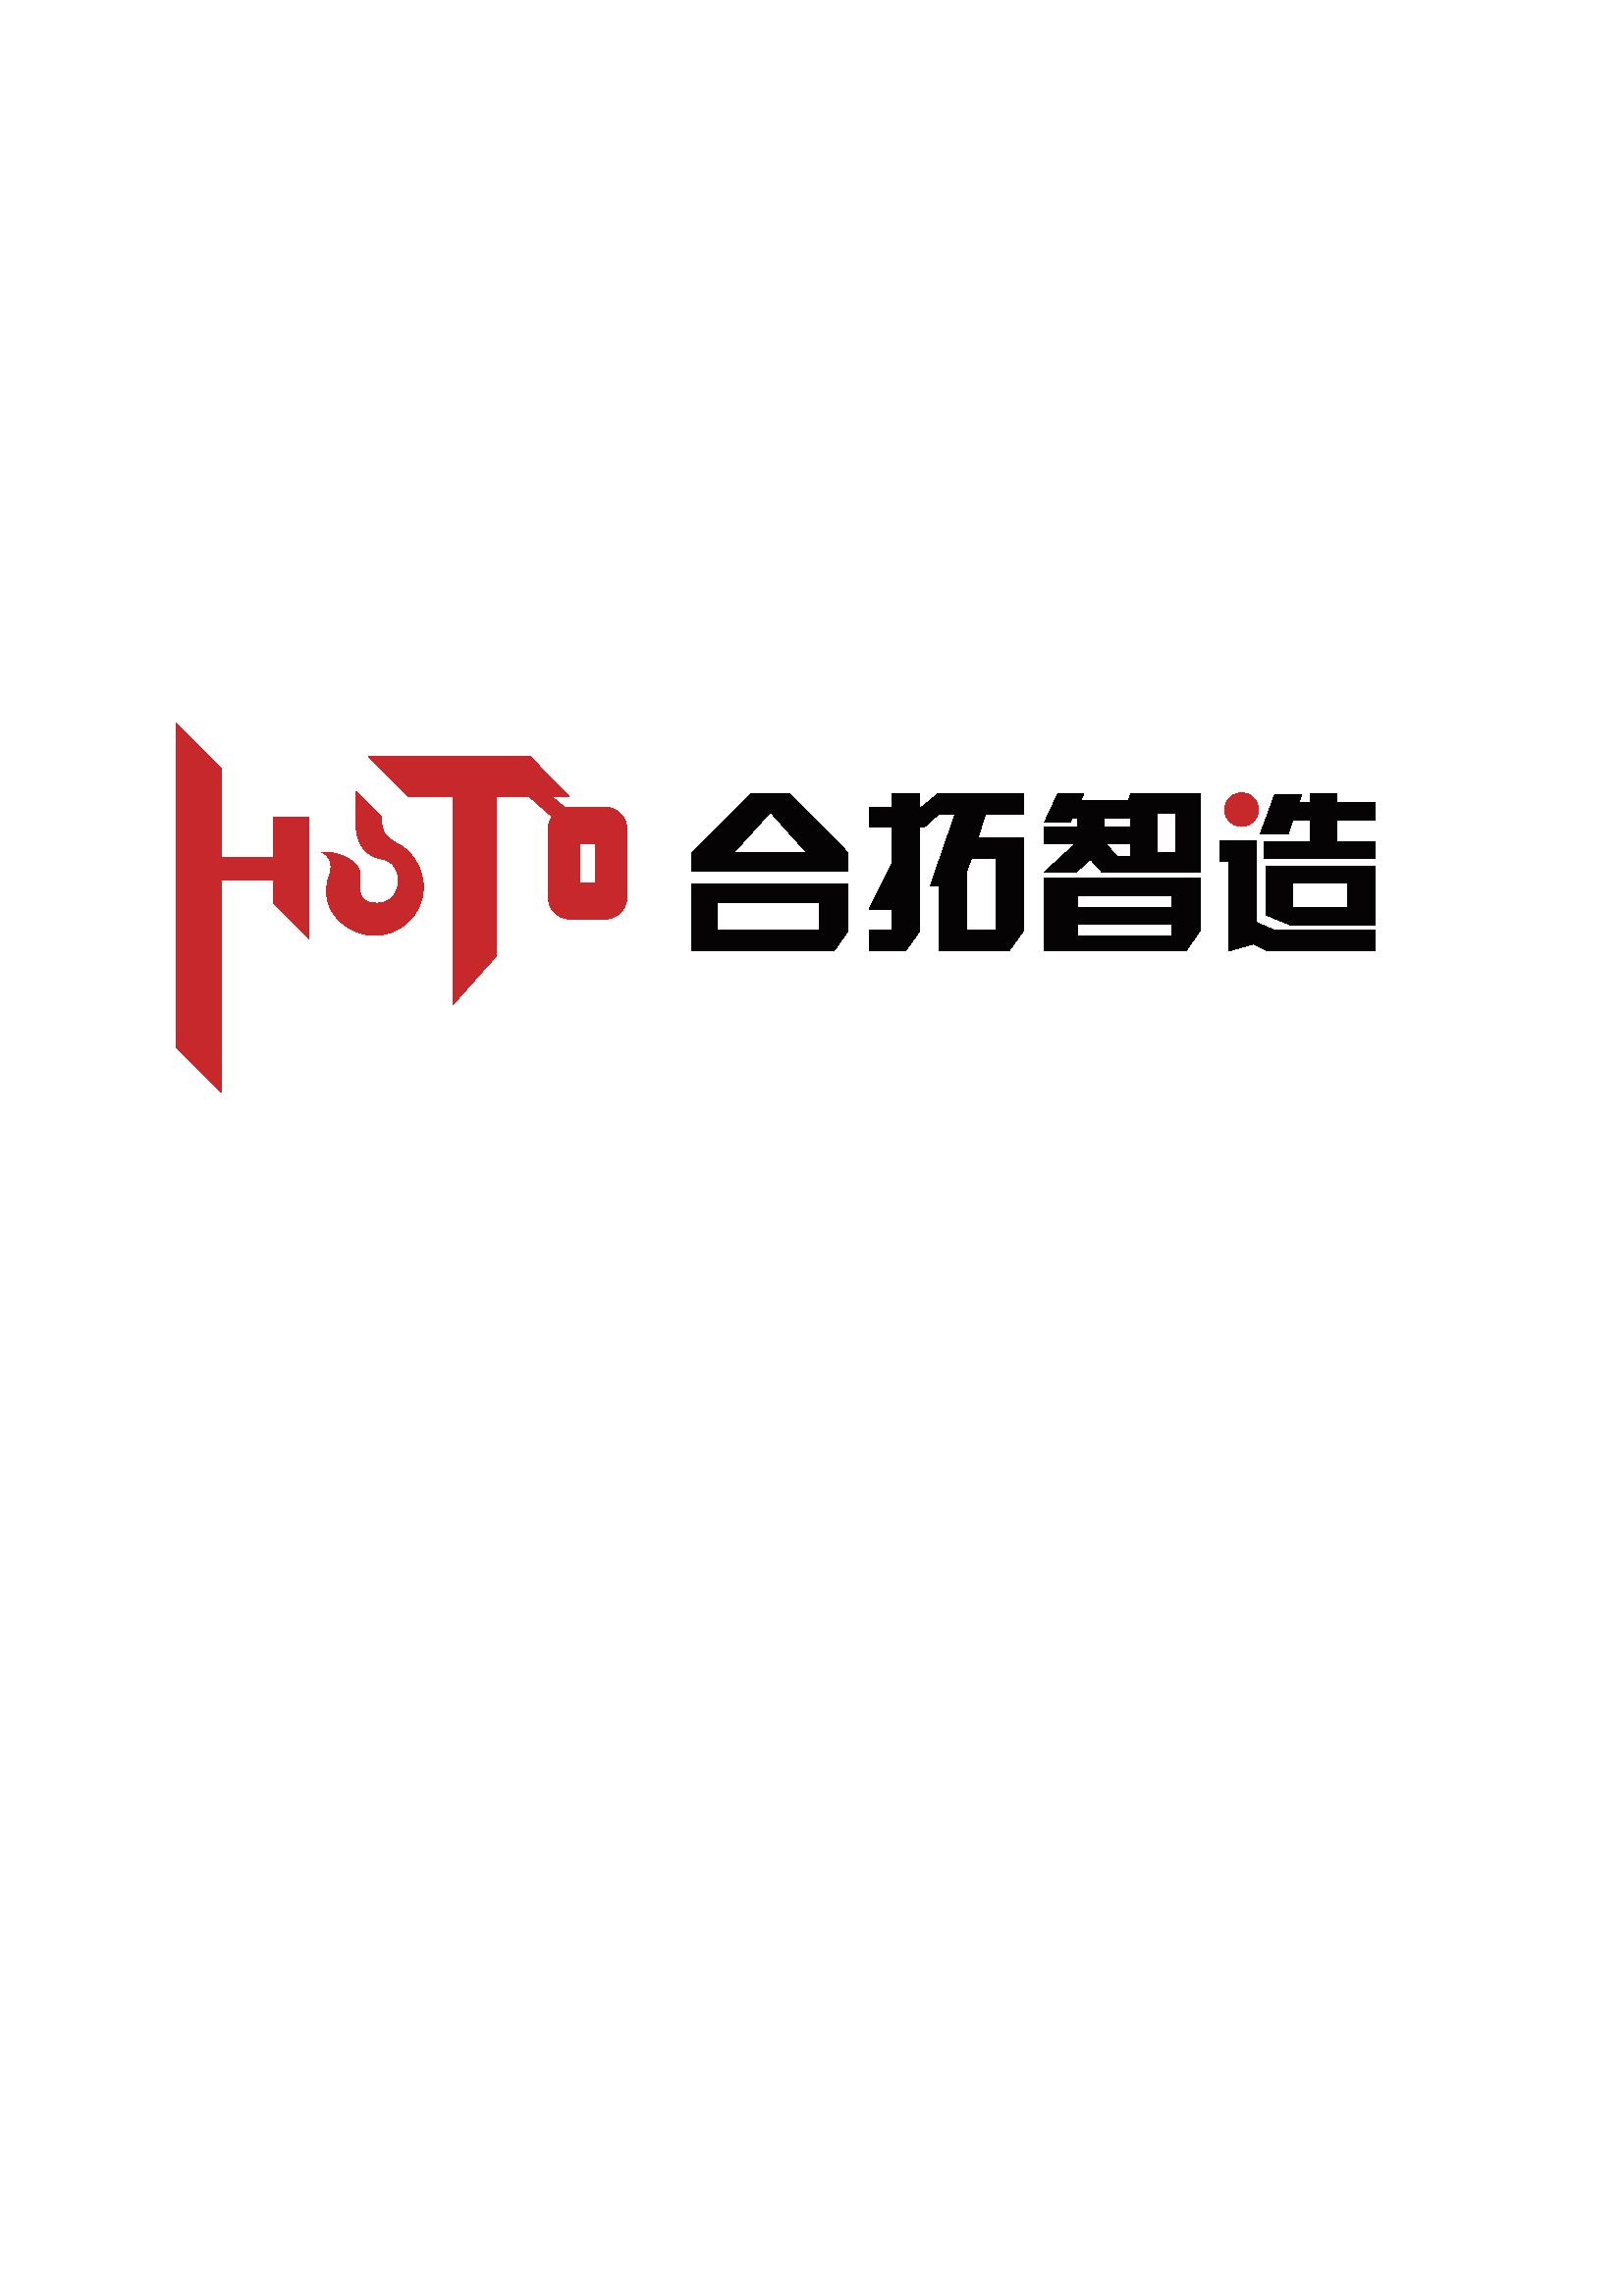 Beijing HOTO Materials Handling Equipment Co., Ltd.